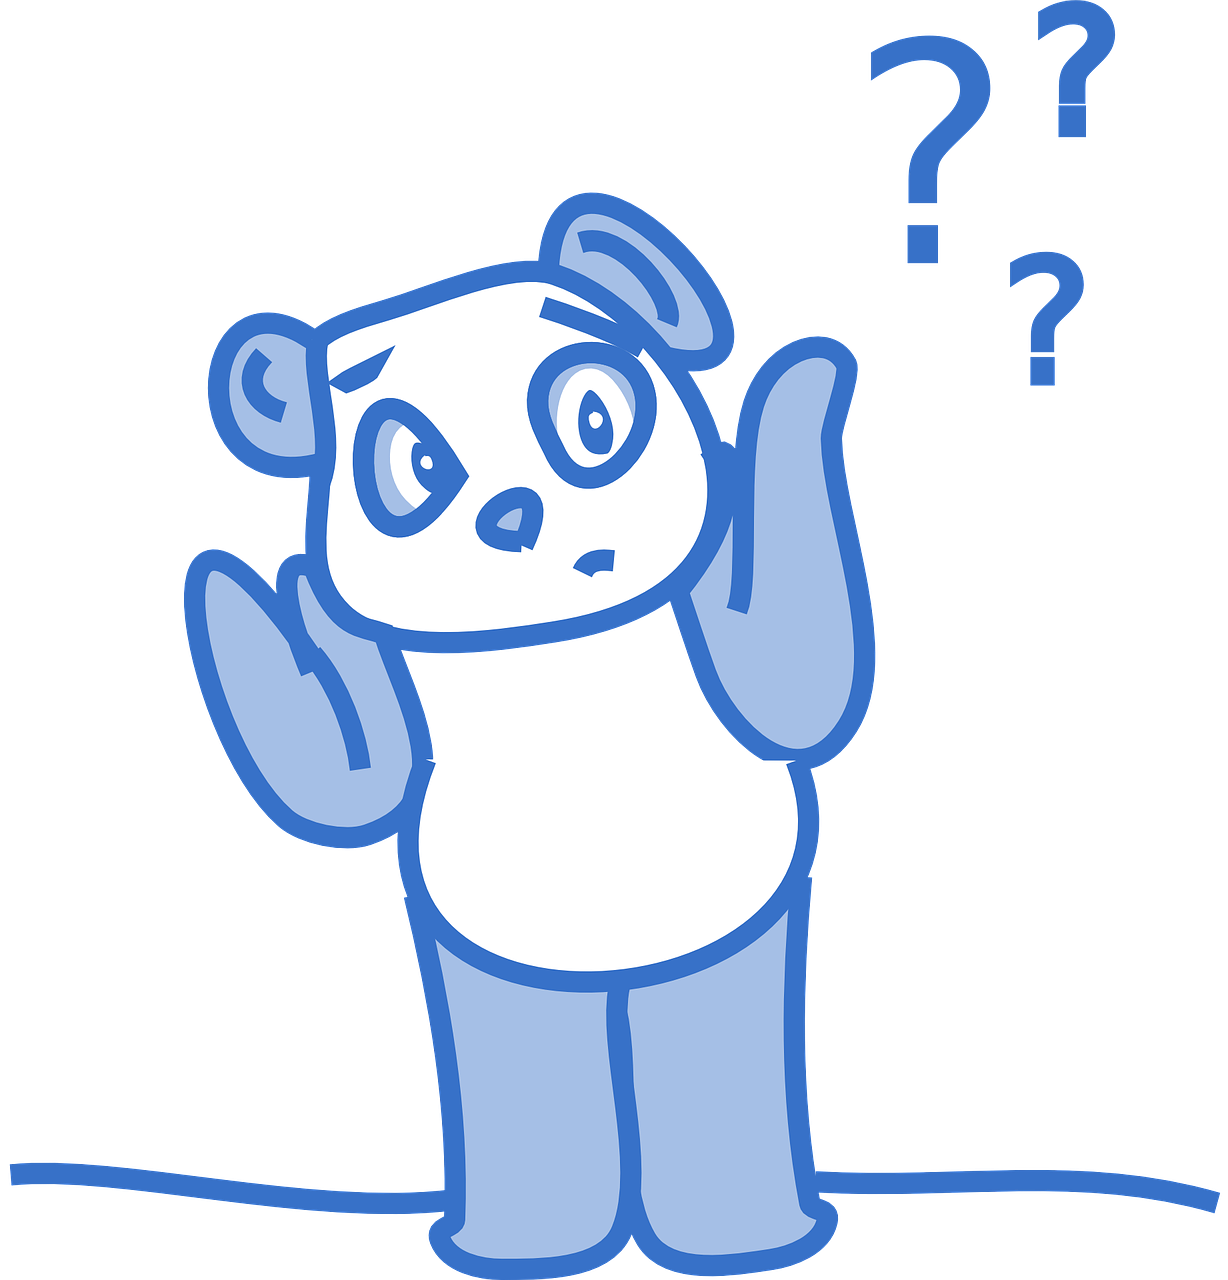 InfoPills: Cos'è la Dispepsia?